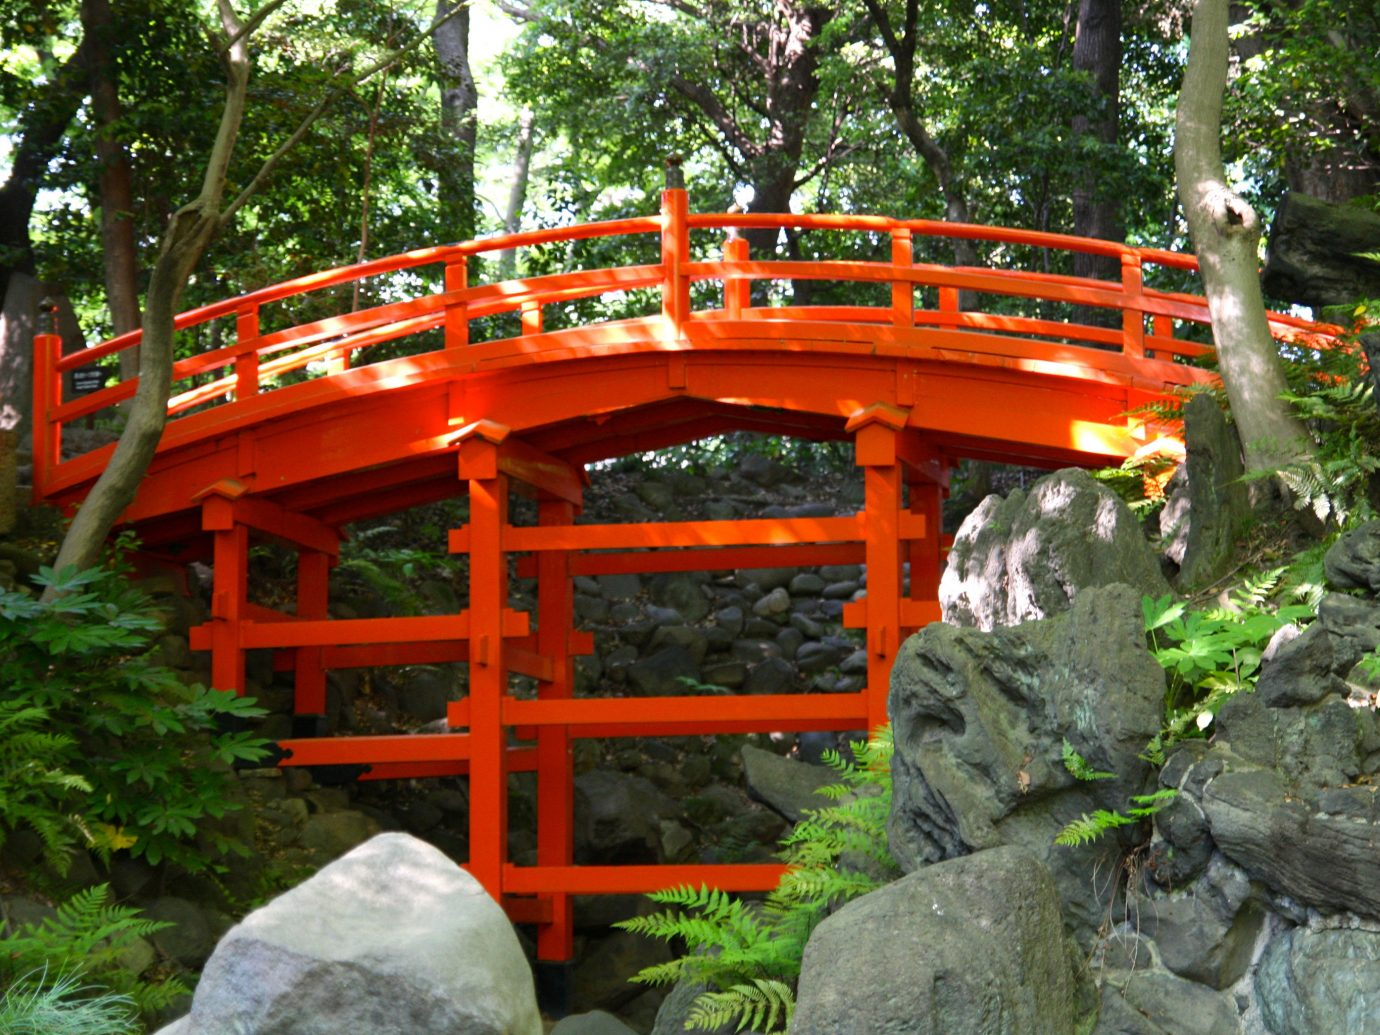 Trip Ideas tree outdoor torii orange shinto shrine outdoor structure shrine Garden flower Jungle rainforest outdoor object wood Forest stone trunk